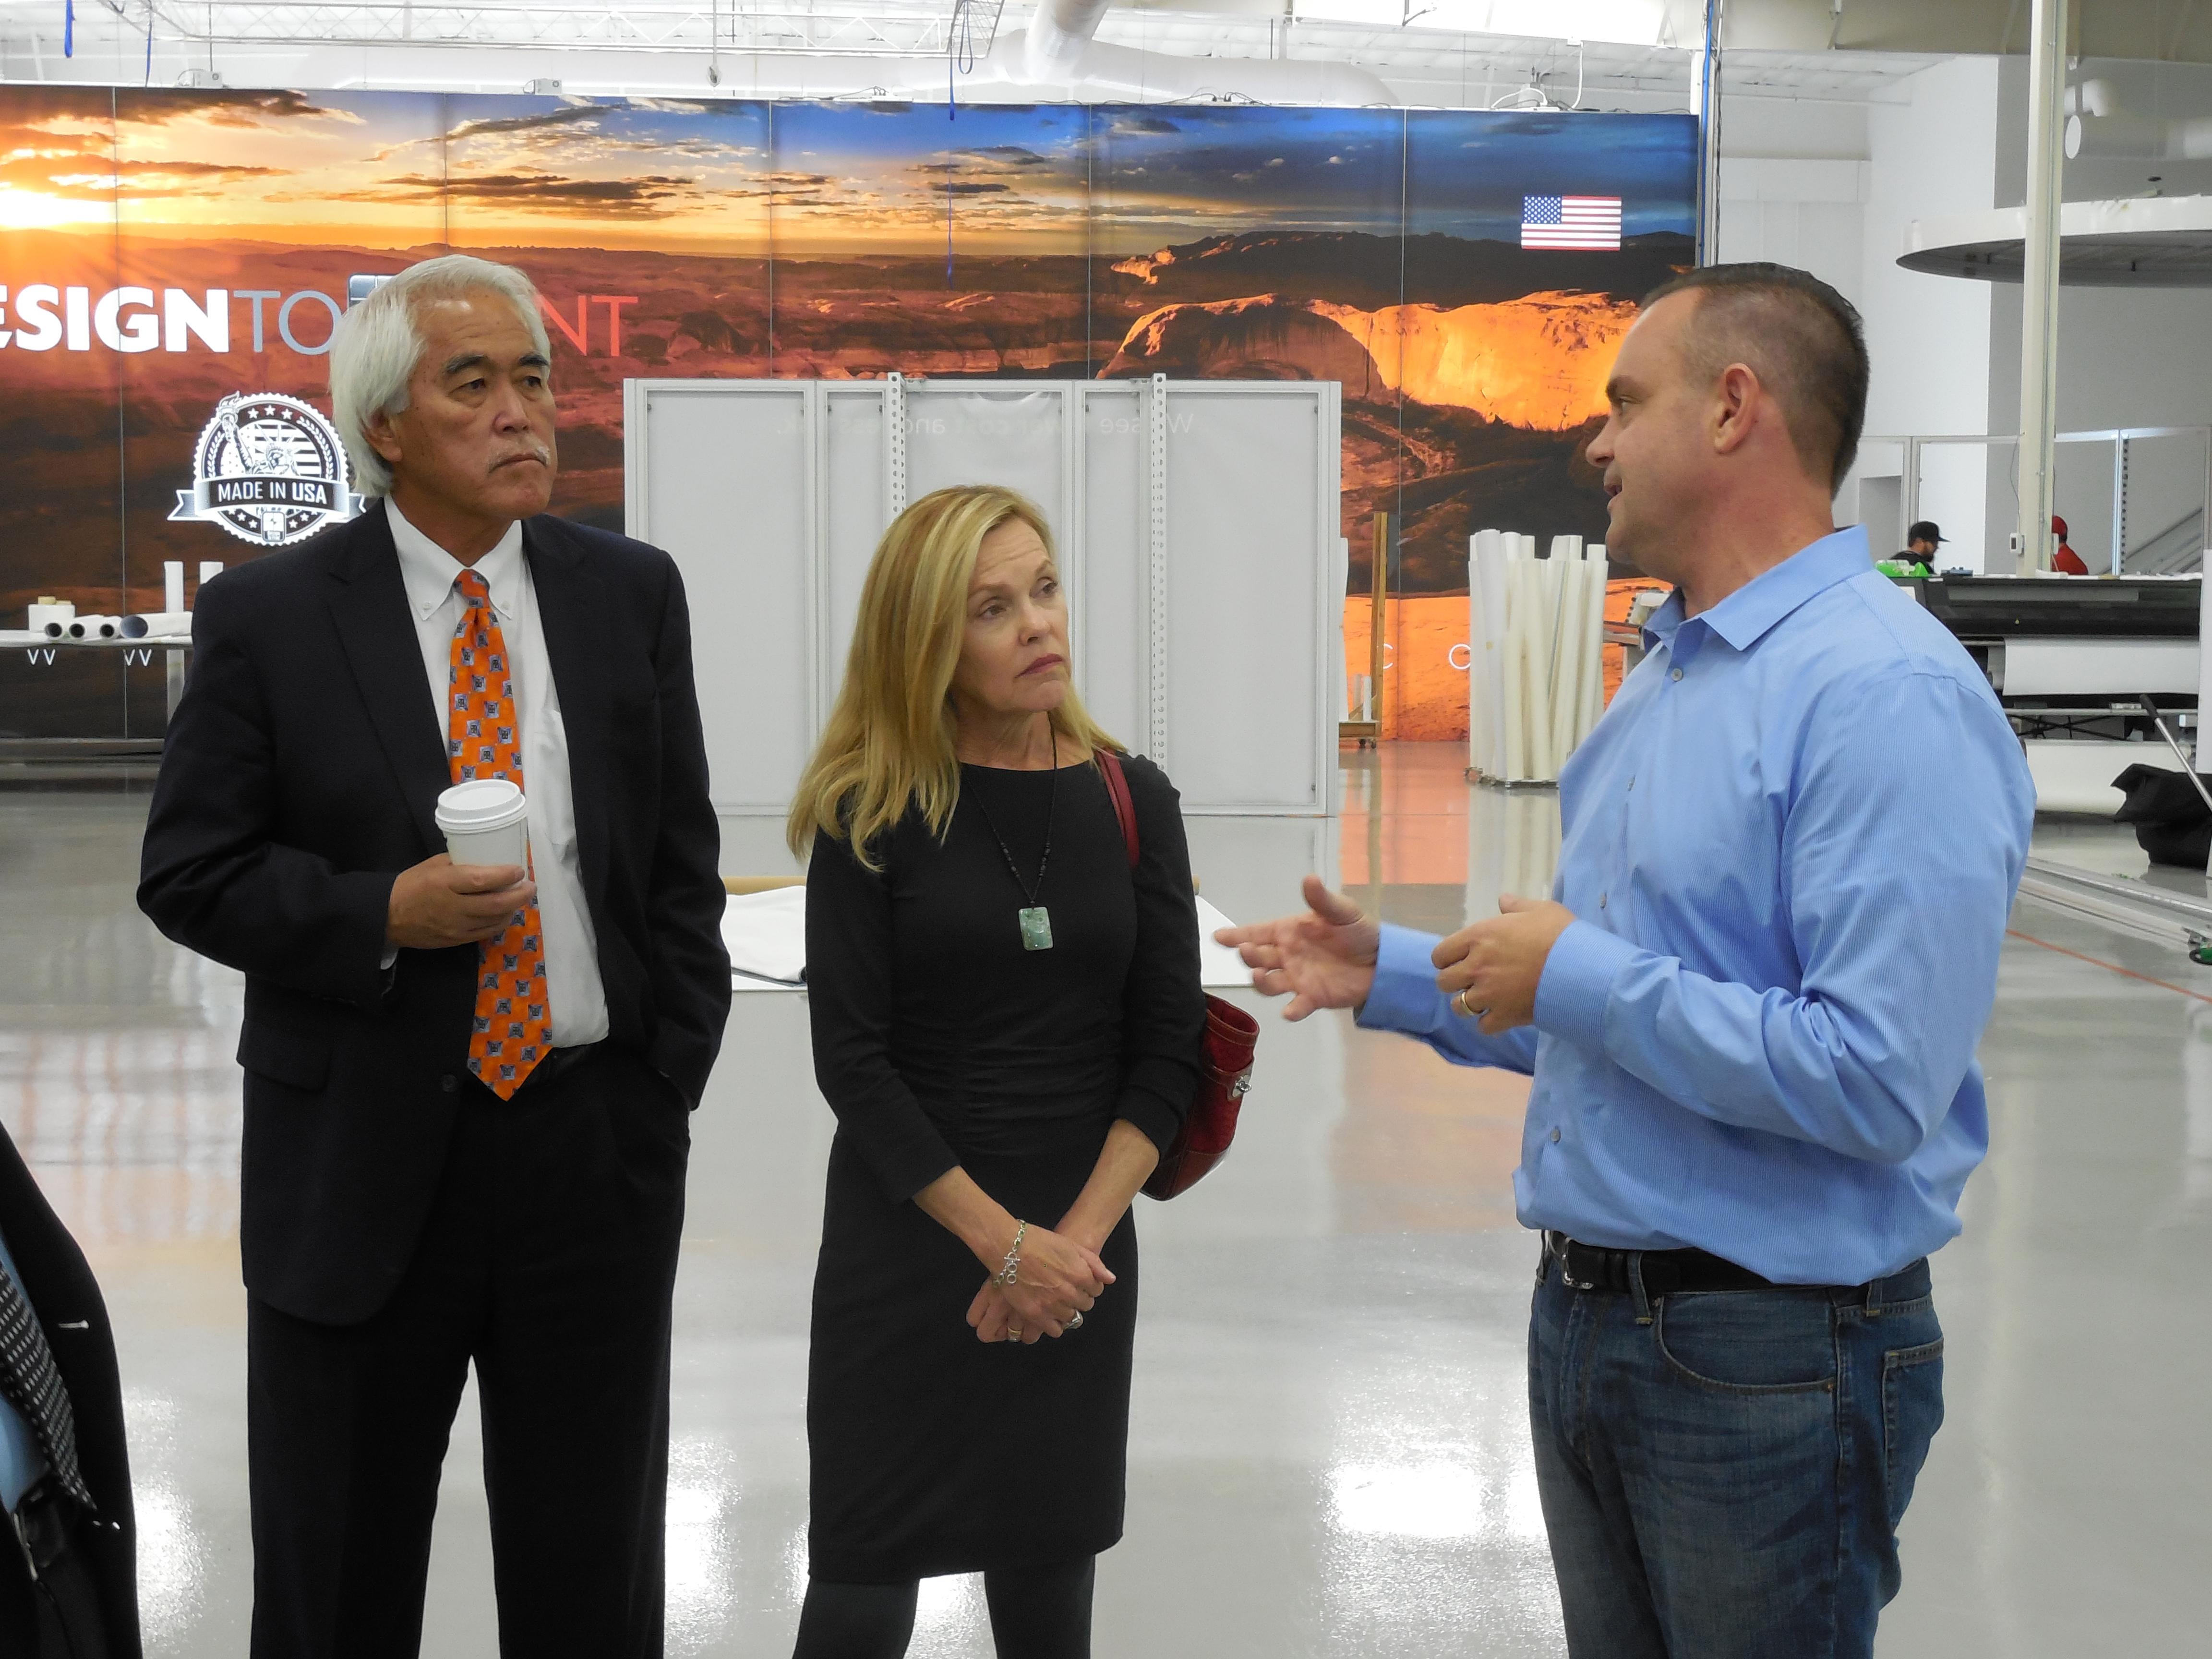 L-R, Stan Nakano, Betsy Markey and Josh Bevans. Bevans gives Markey and Nakano a tour of local business Design to Print, St. George, Utah, Nov. 17, 2016 | Photo by Julie Applegate, St. George News